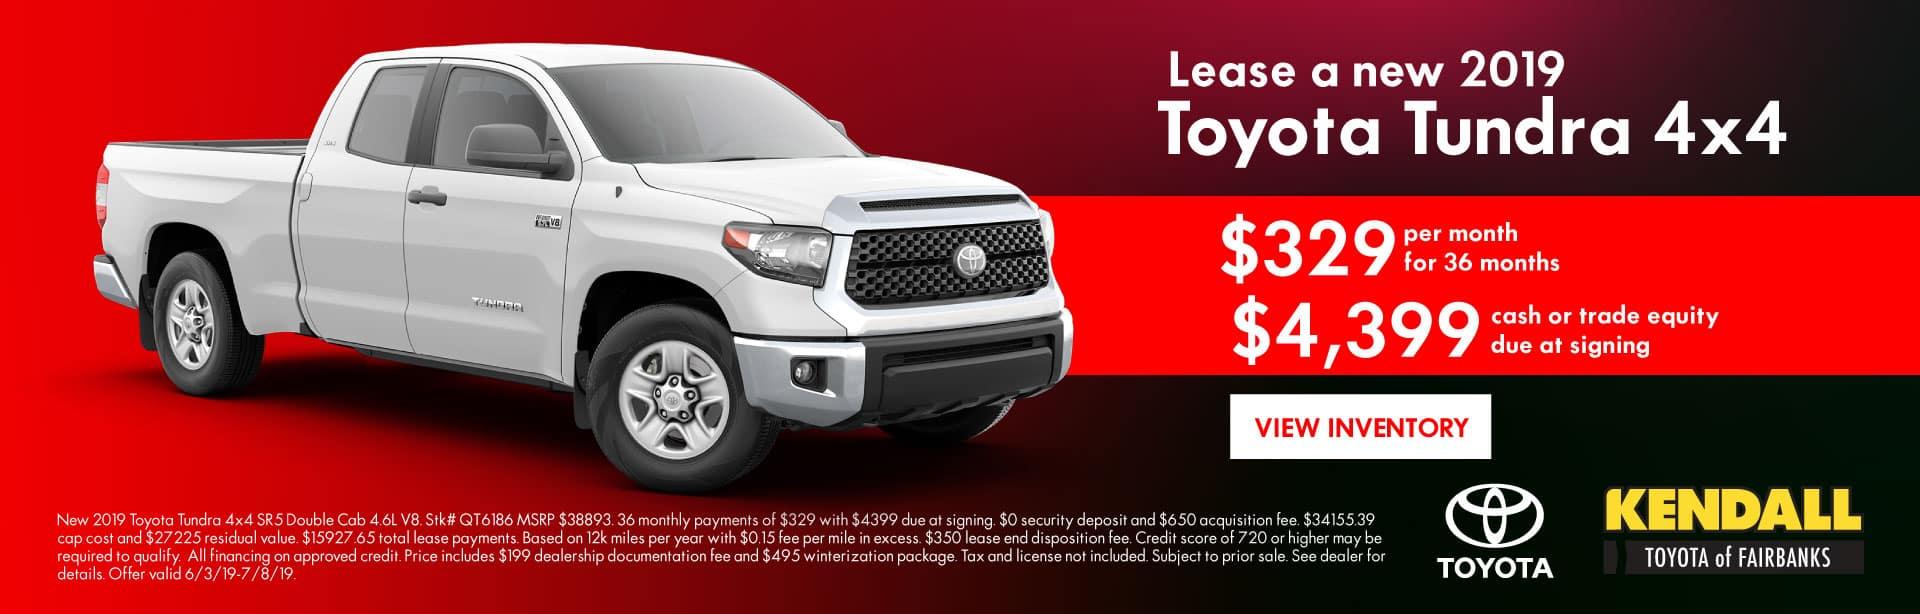 Kendall Toyota Fairbanks >> Kendall Toyota of Fairbanks | New Toyota & Used Car Dealership in Fairbanks, AK